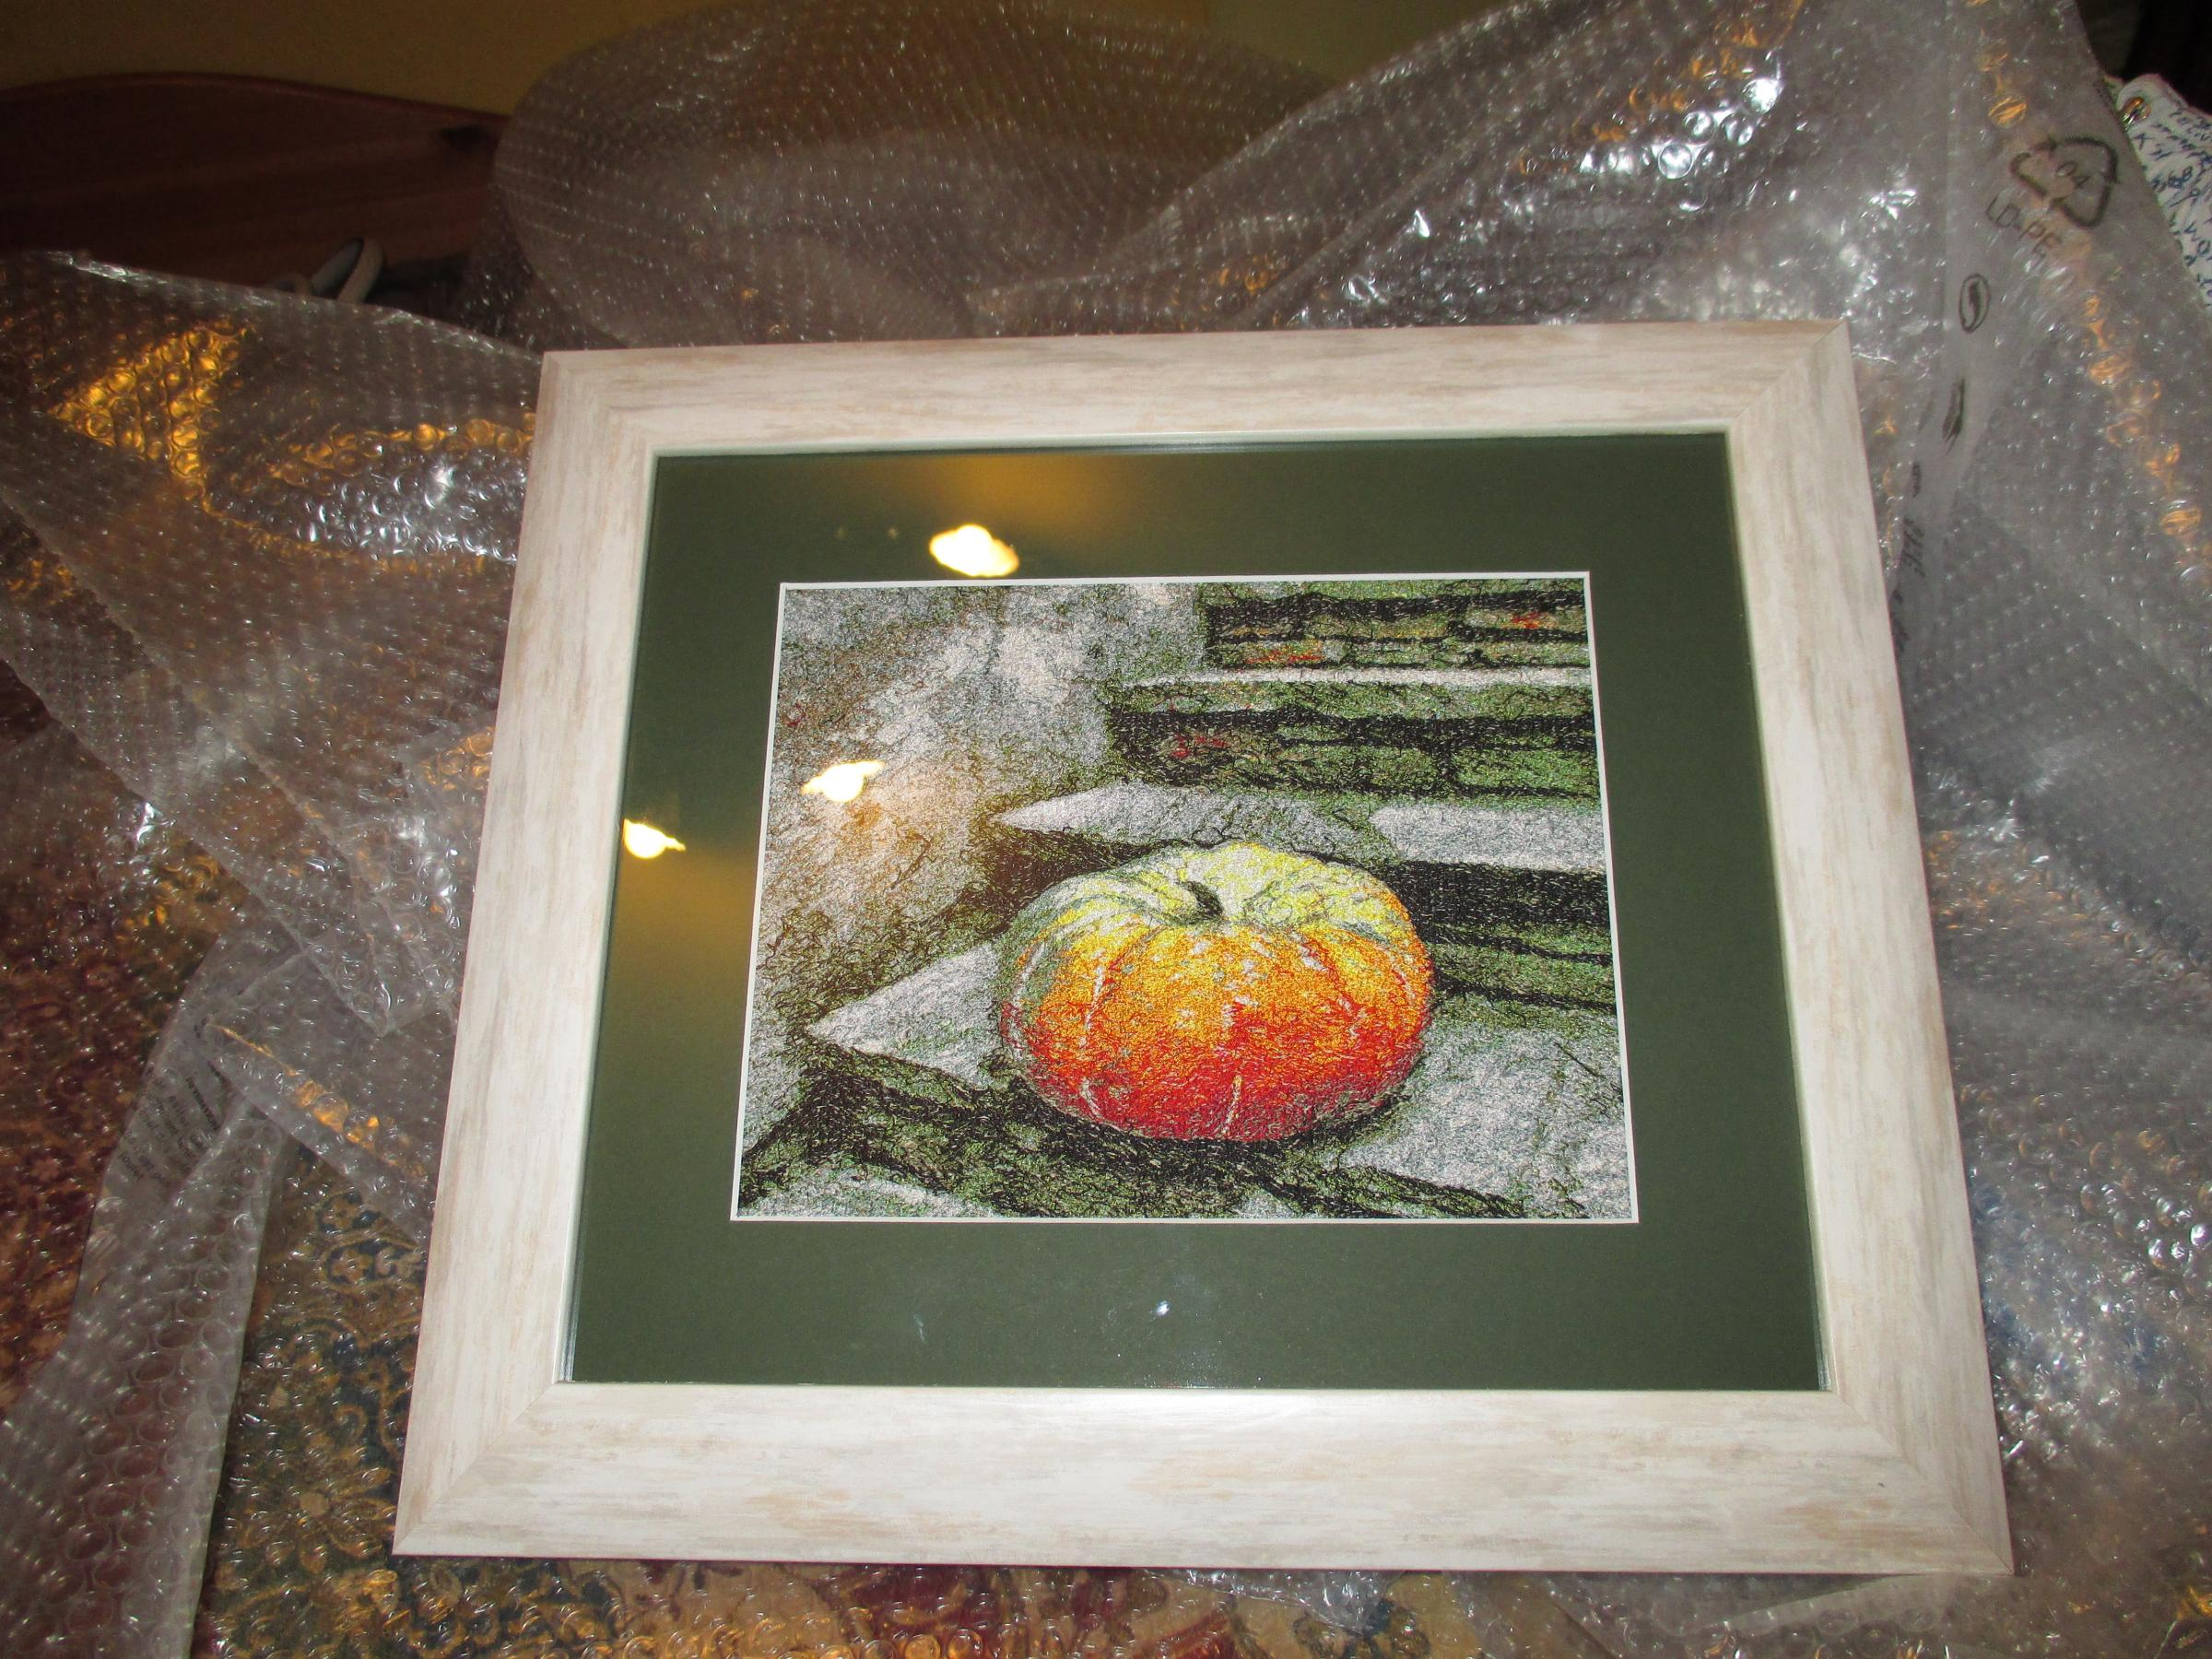 Framed Pumpkin photo stitch embroidery design